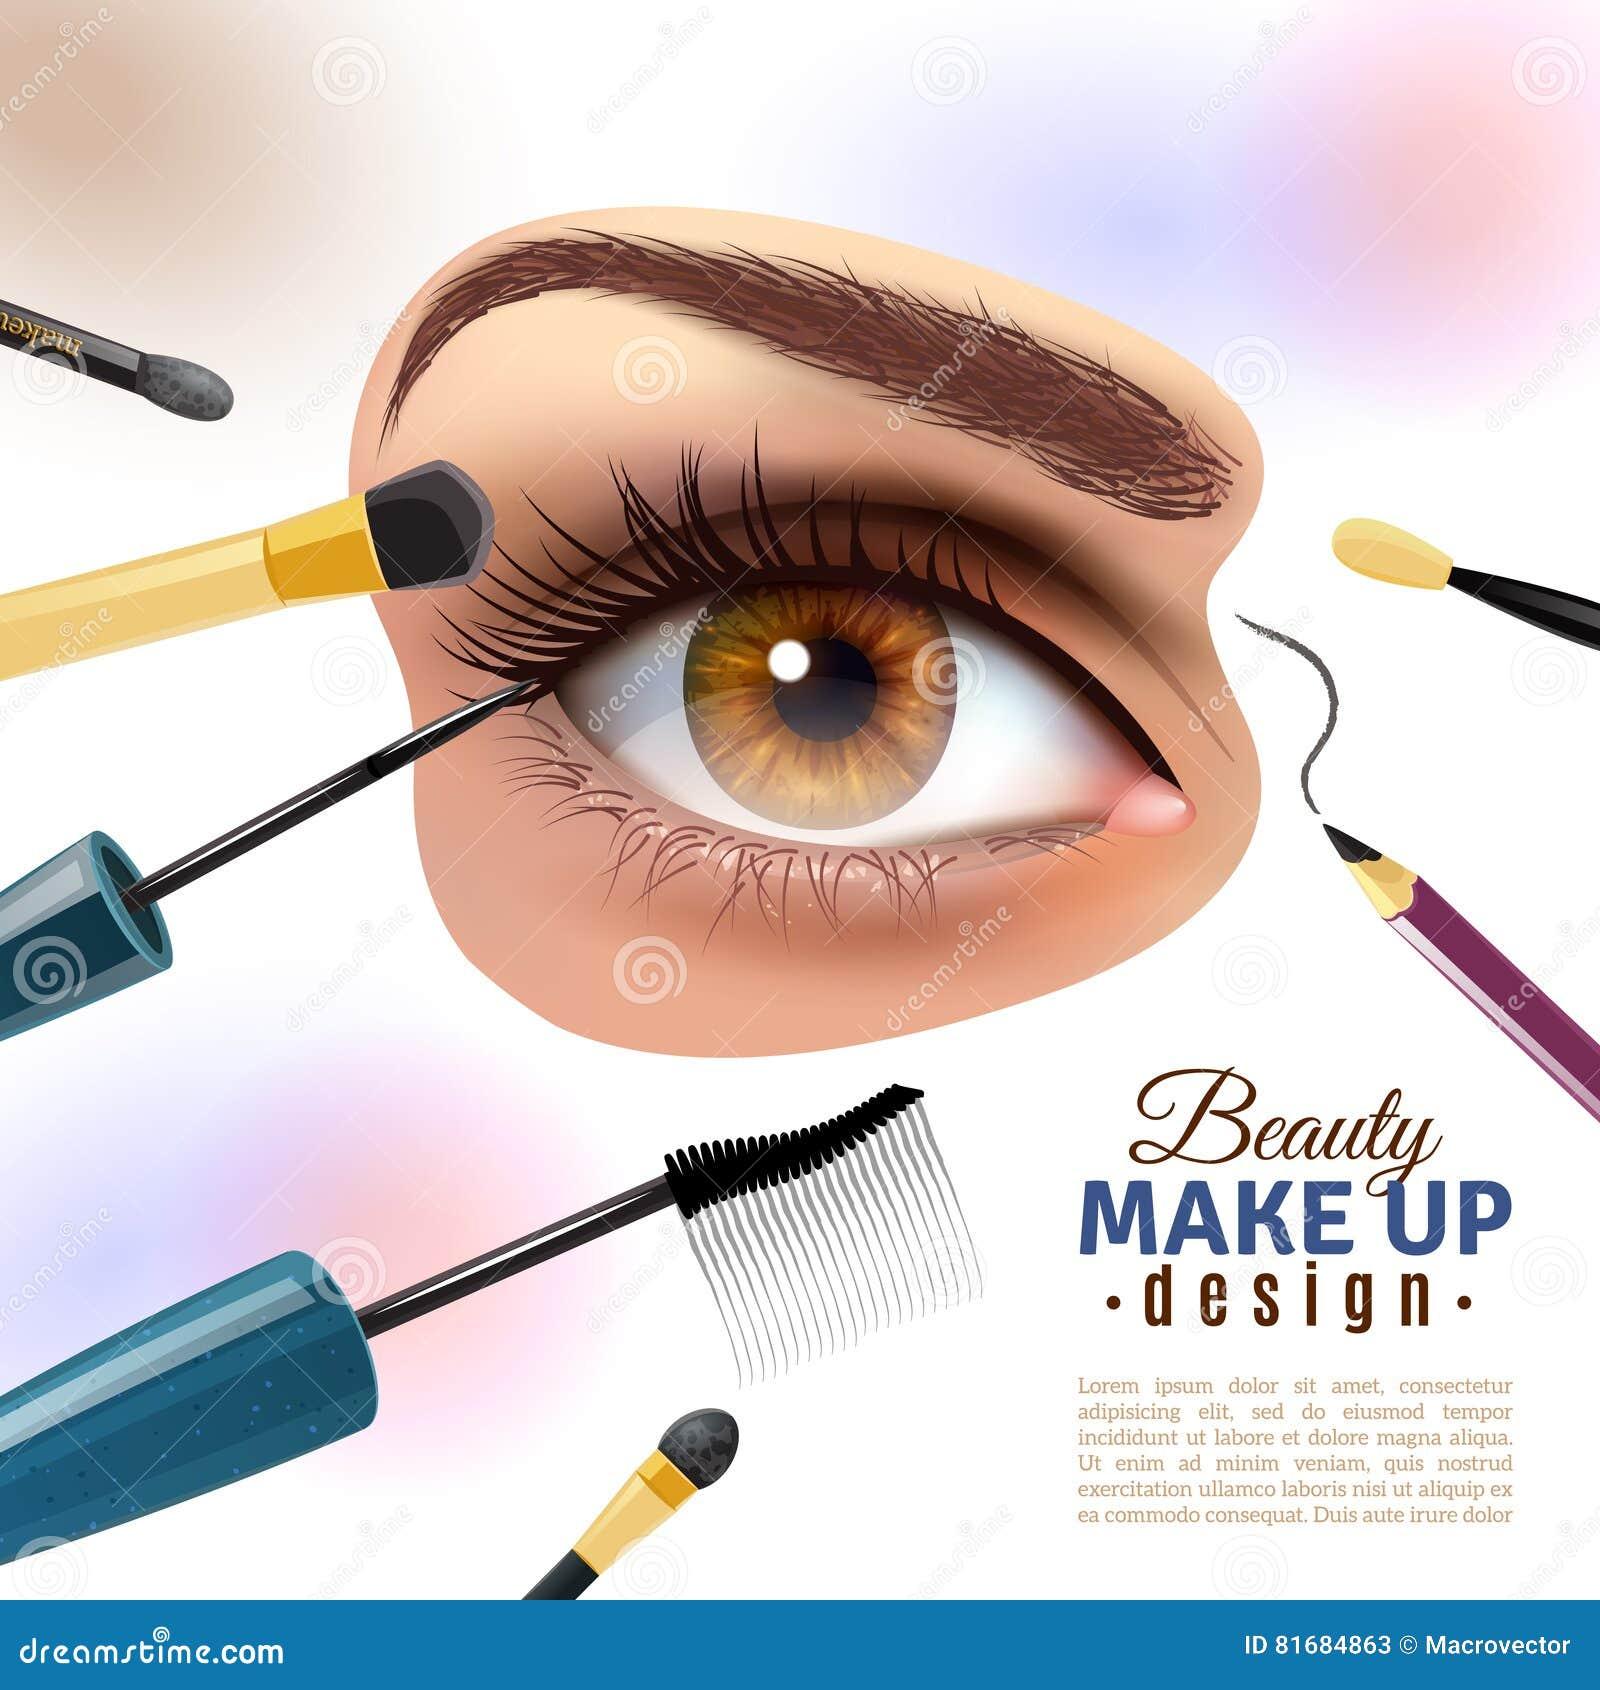 Eye Makeup Blurred Background Poster Stock Vector Illustration Of